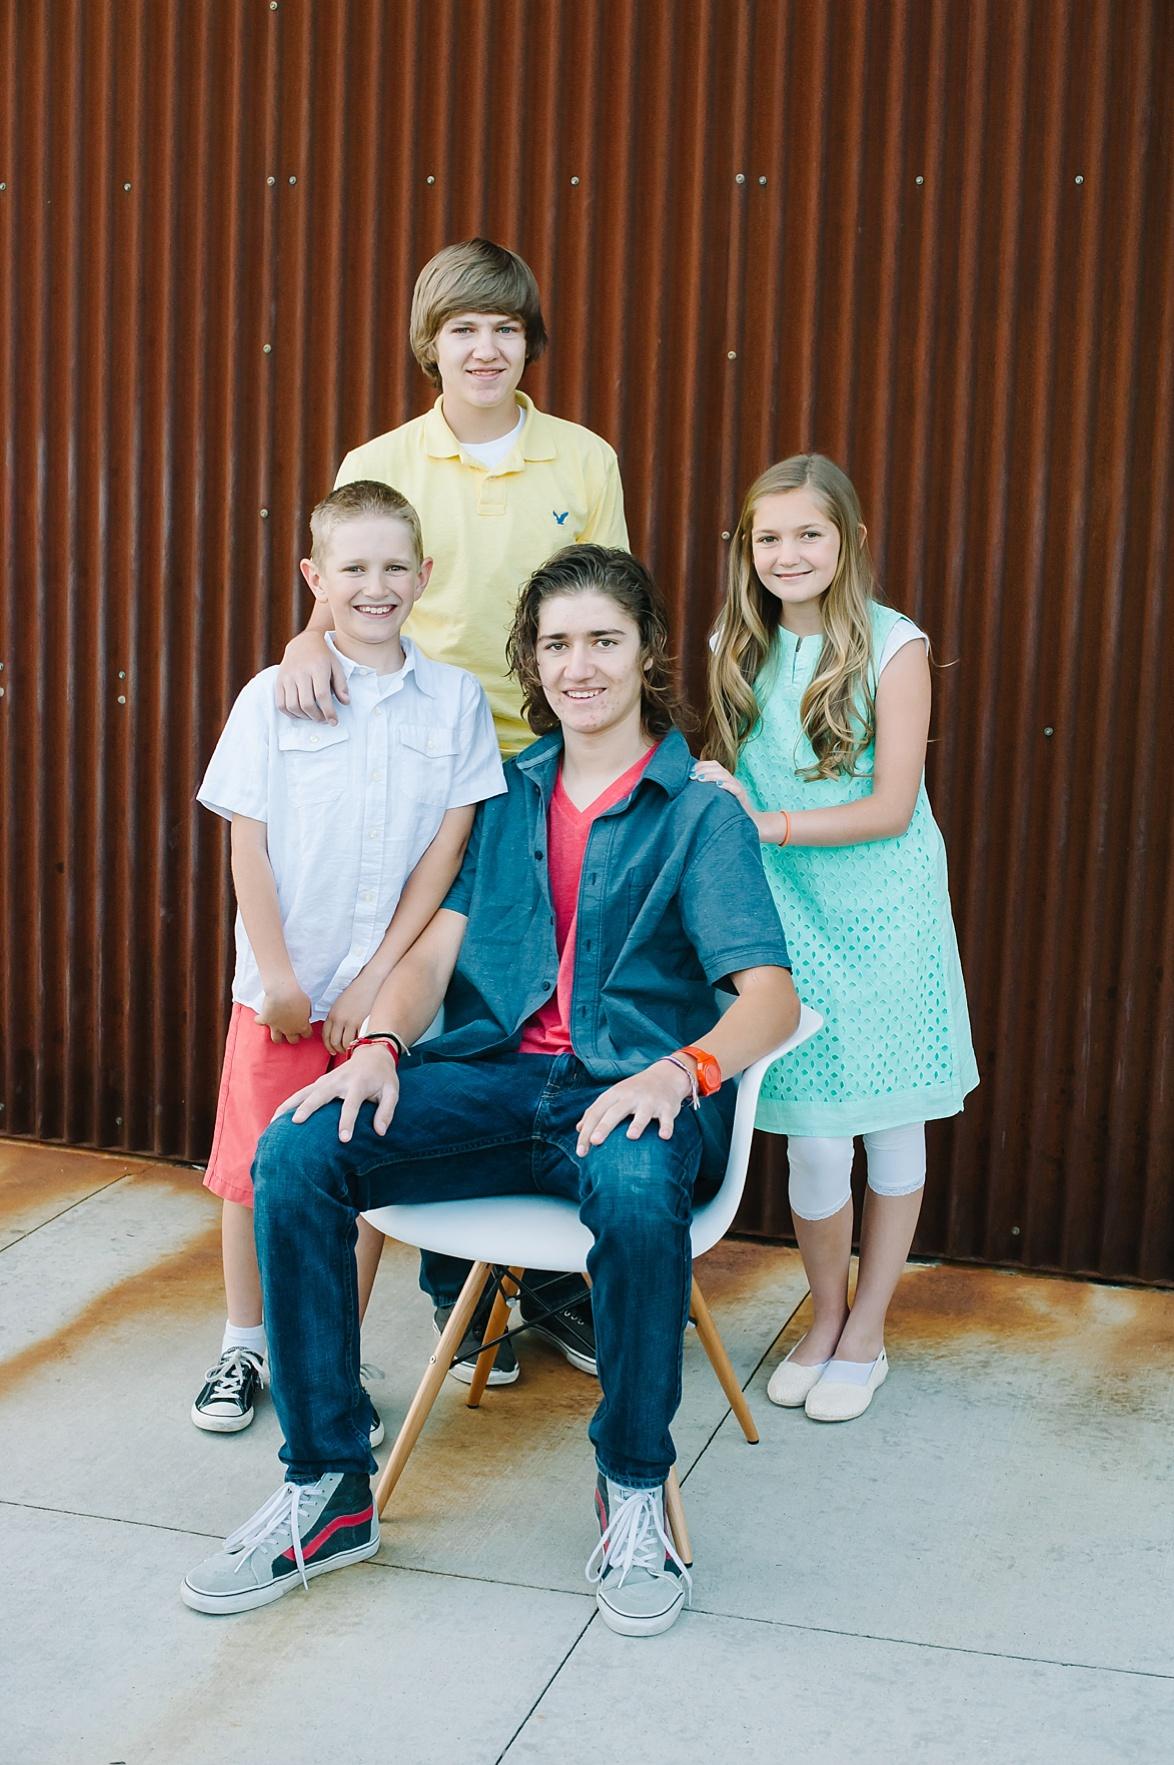 Daybreak Utah Extended Family Photographer Ali Sumsion 017